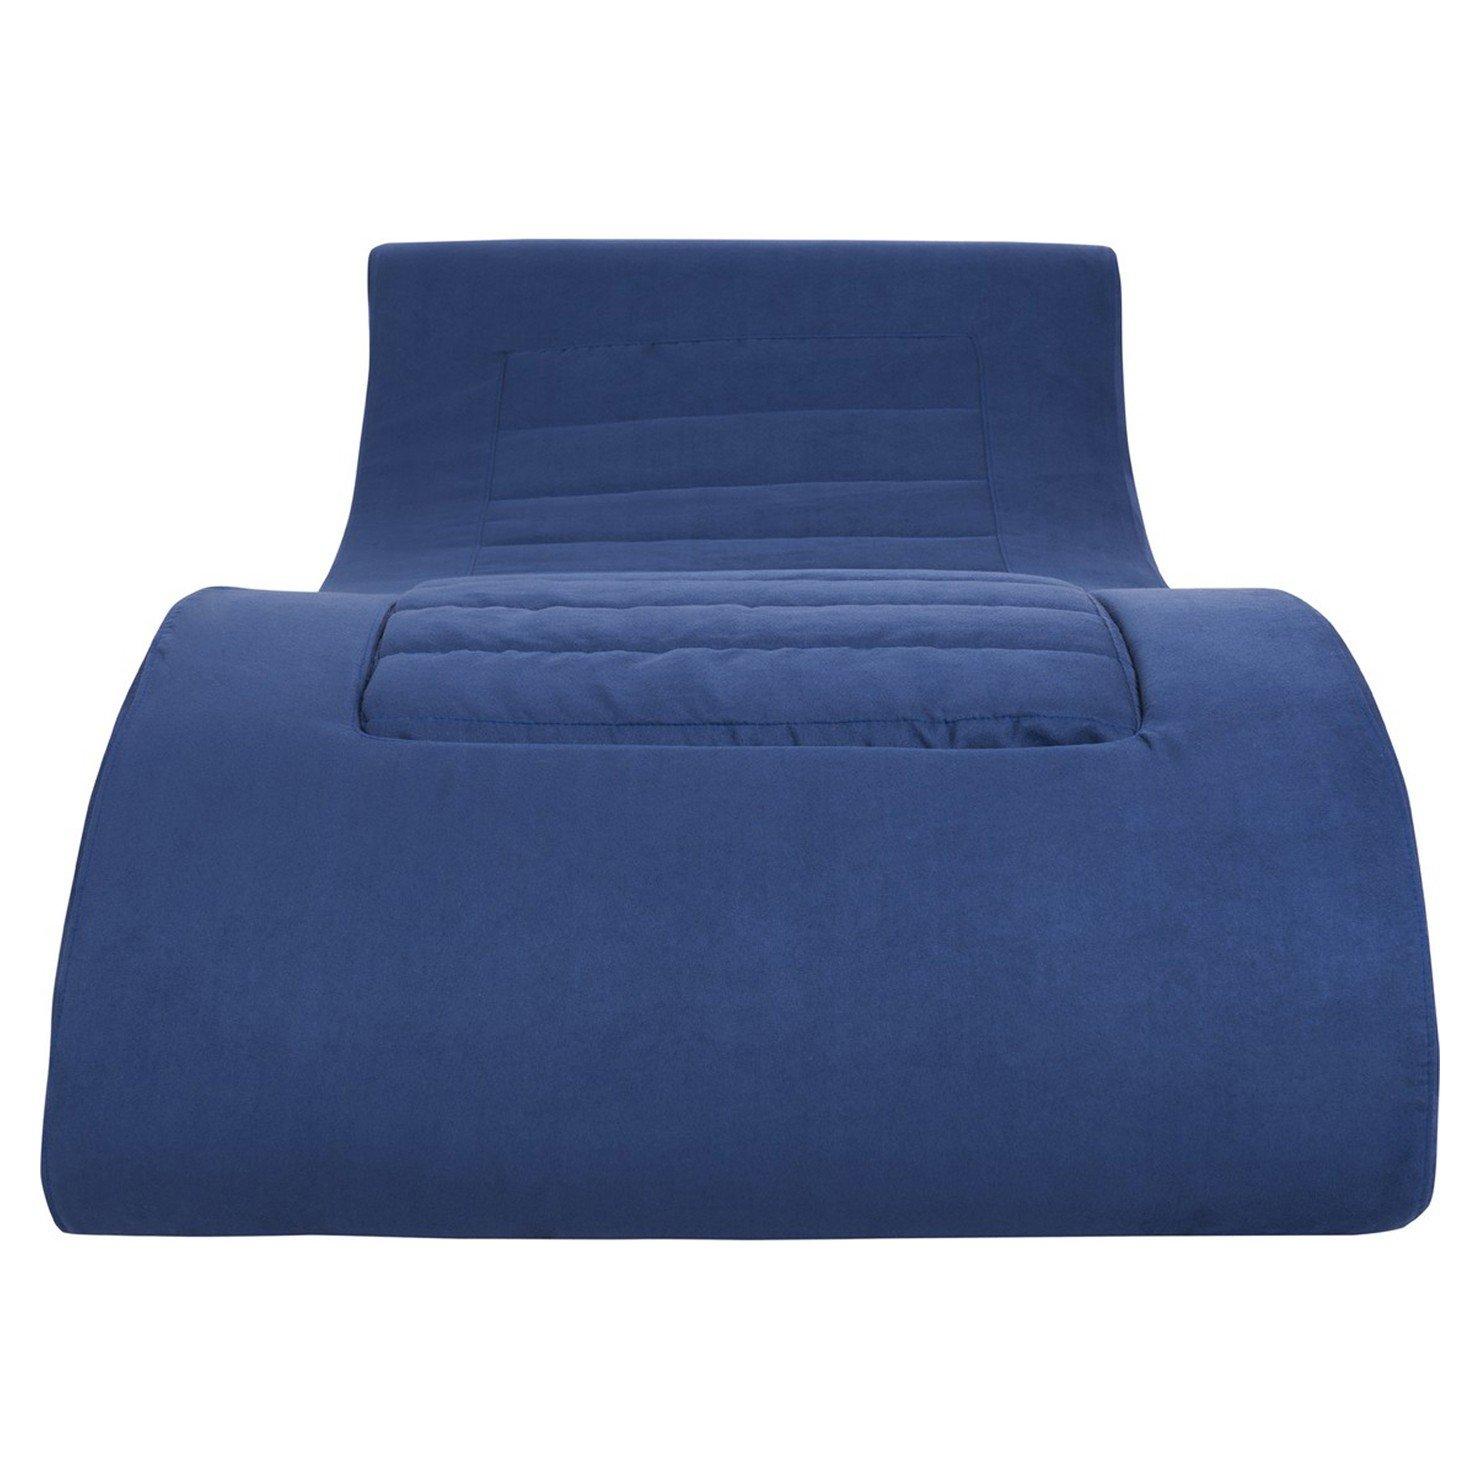 Homemania Aramis Feelings Chaise Longue Brownie Blu